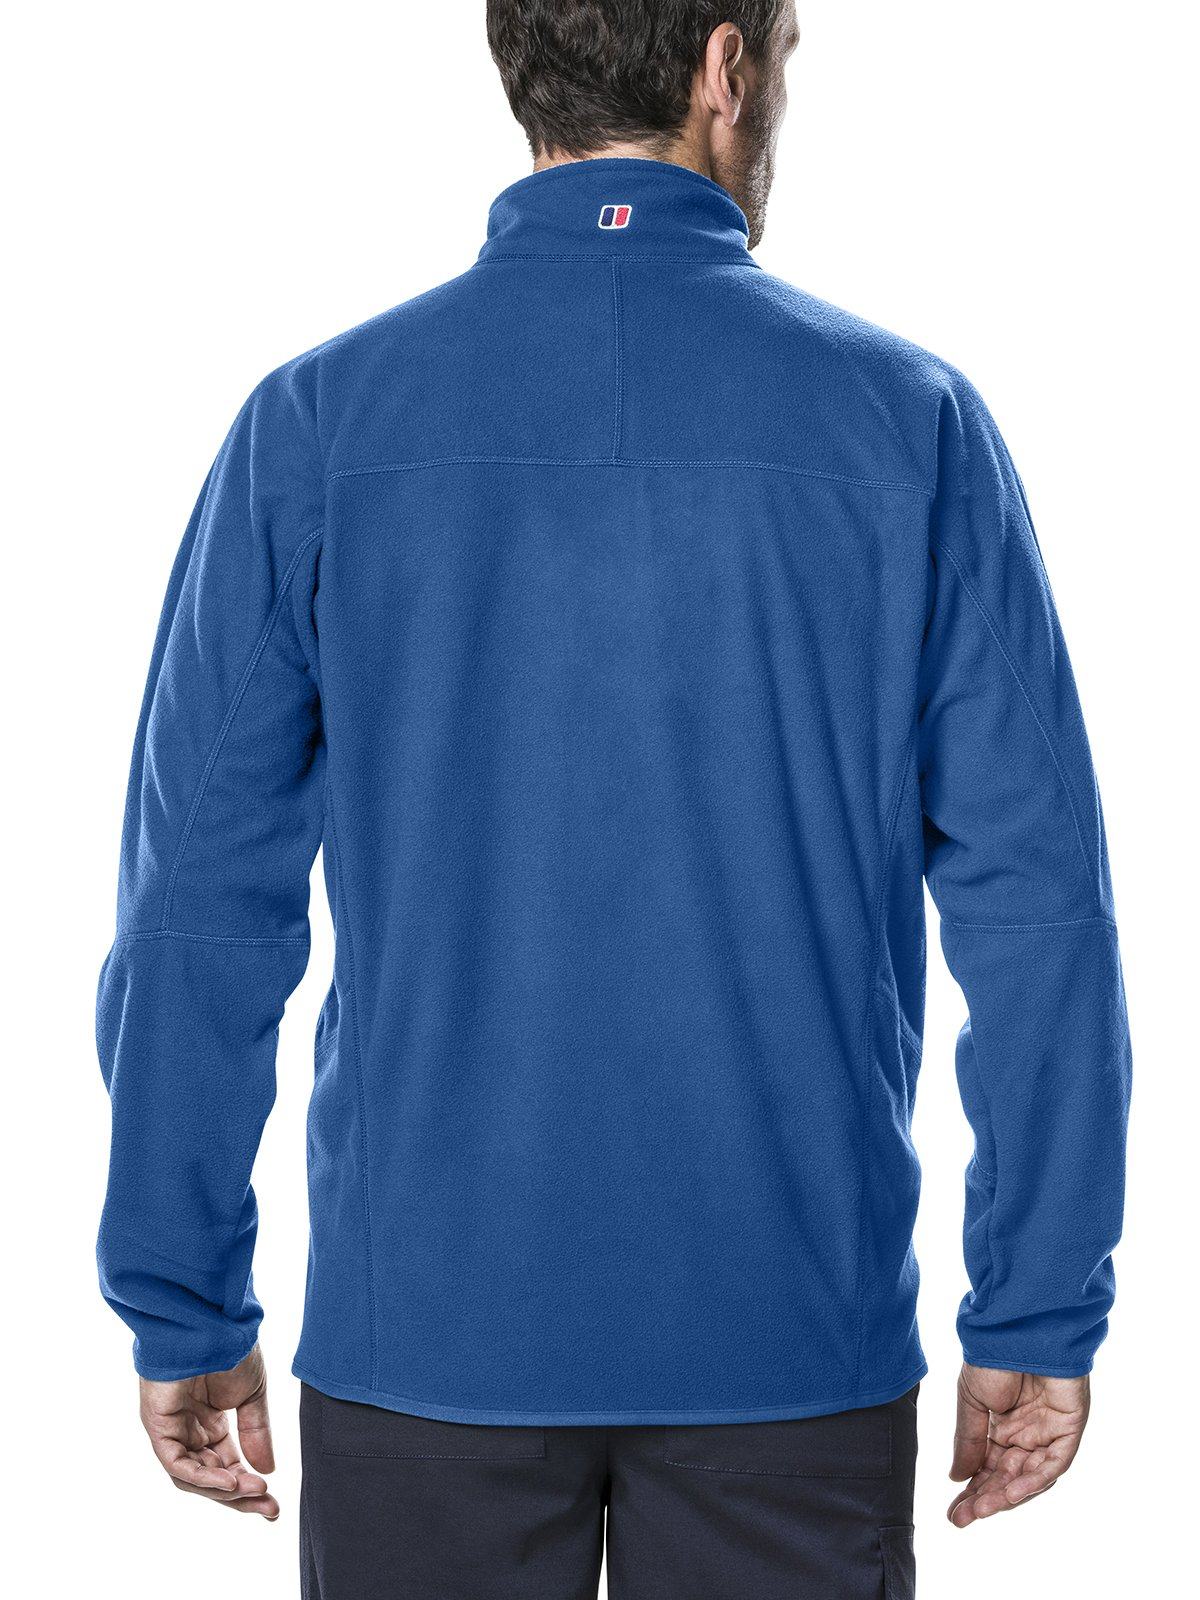 Berghaus Mens Spectrum Micro 2.0 Full Zip Fleece Jacket 4